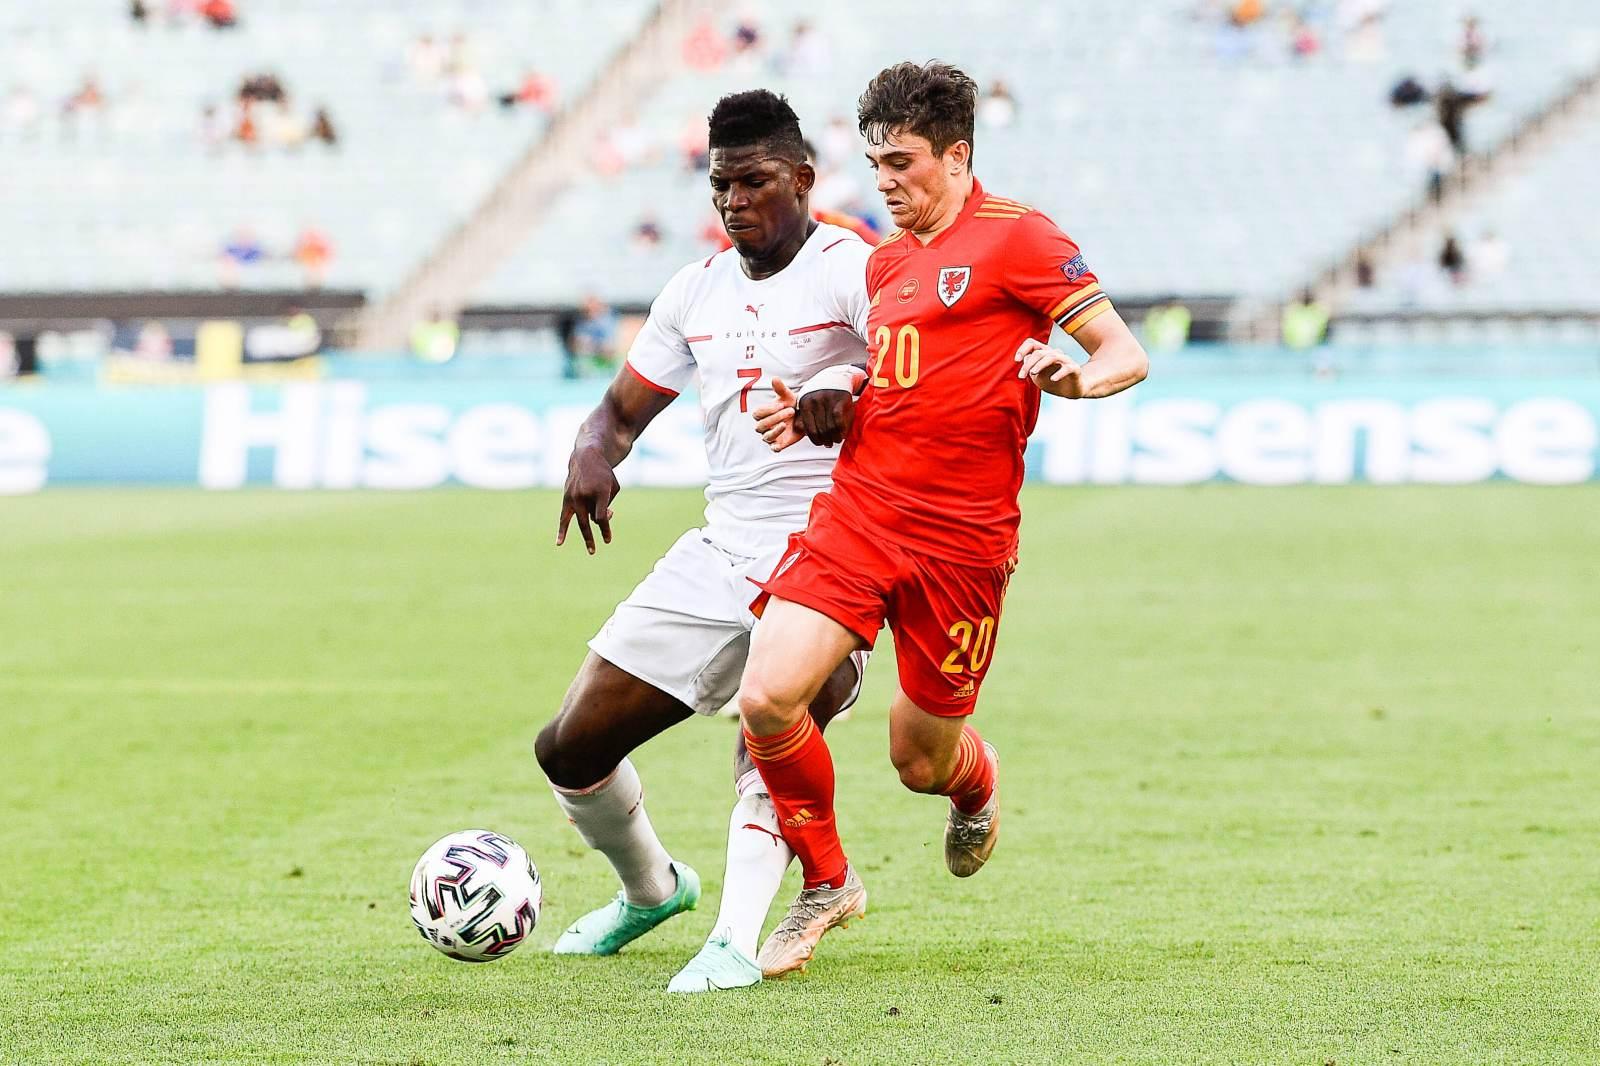 Фердинанд: «Джеймс – игрок не уровня «МЮ»